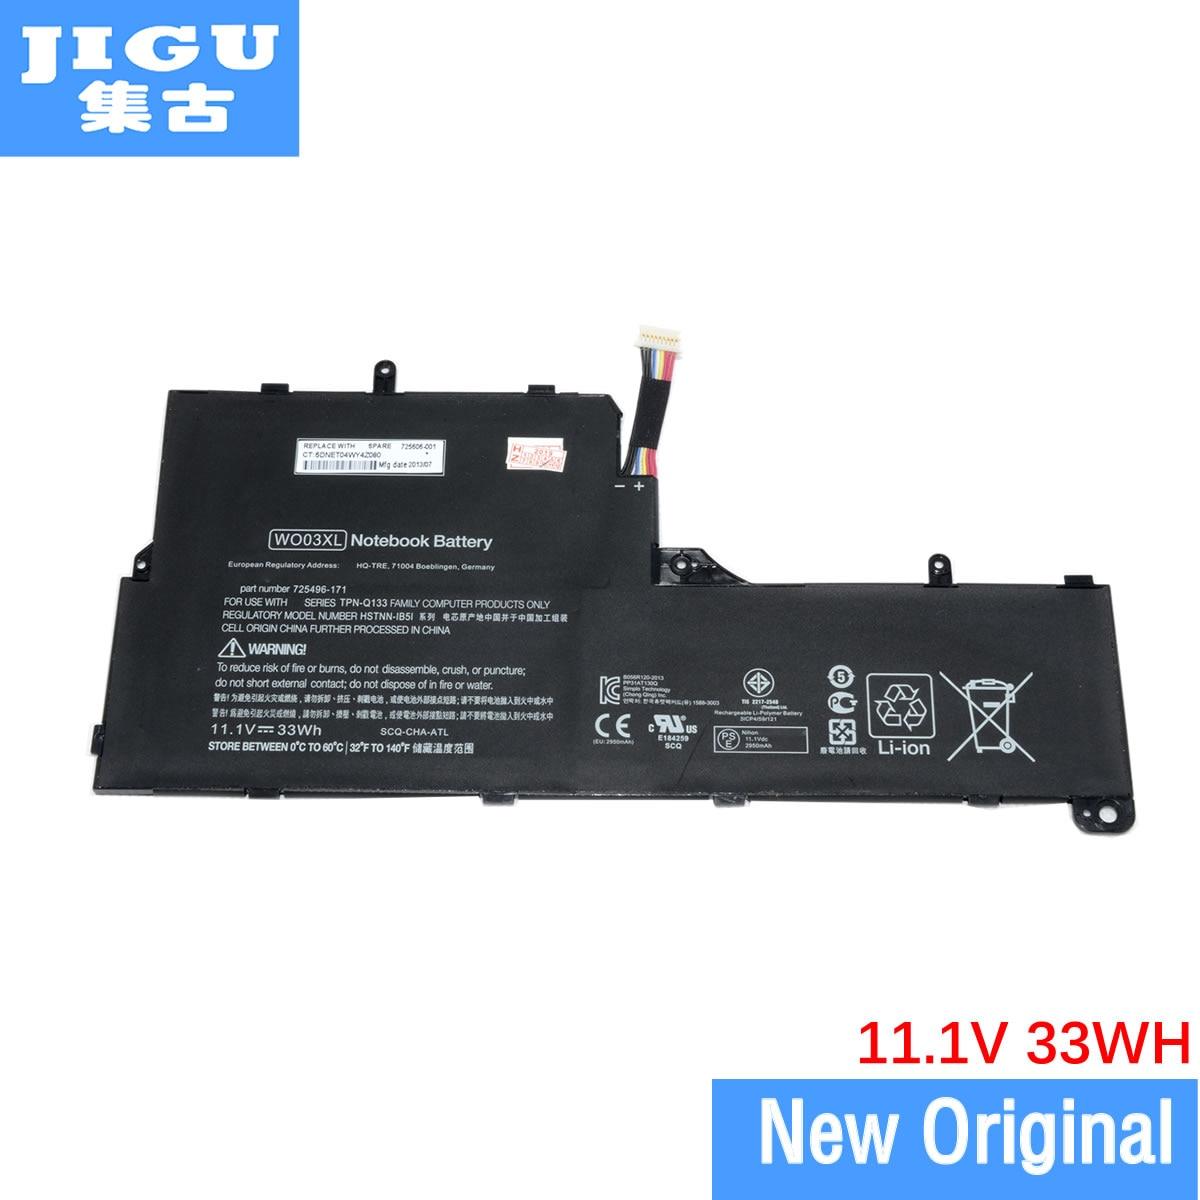 JIGU оригинальный ноутбук Батарея для hp 3ICP3/97/91 609881-131 725607-001 аккумулятор большой емкости HSTNN-1B1W WM06 WO03XL 725496-1B1 HSTNN-IB5i